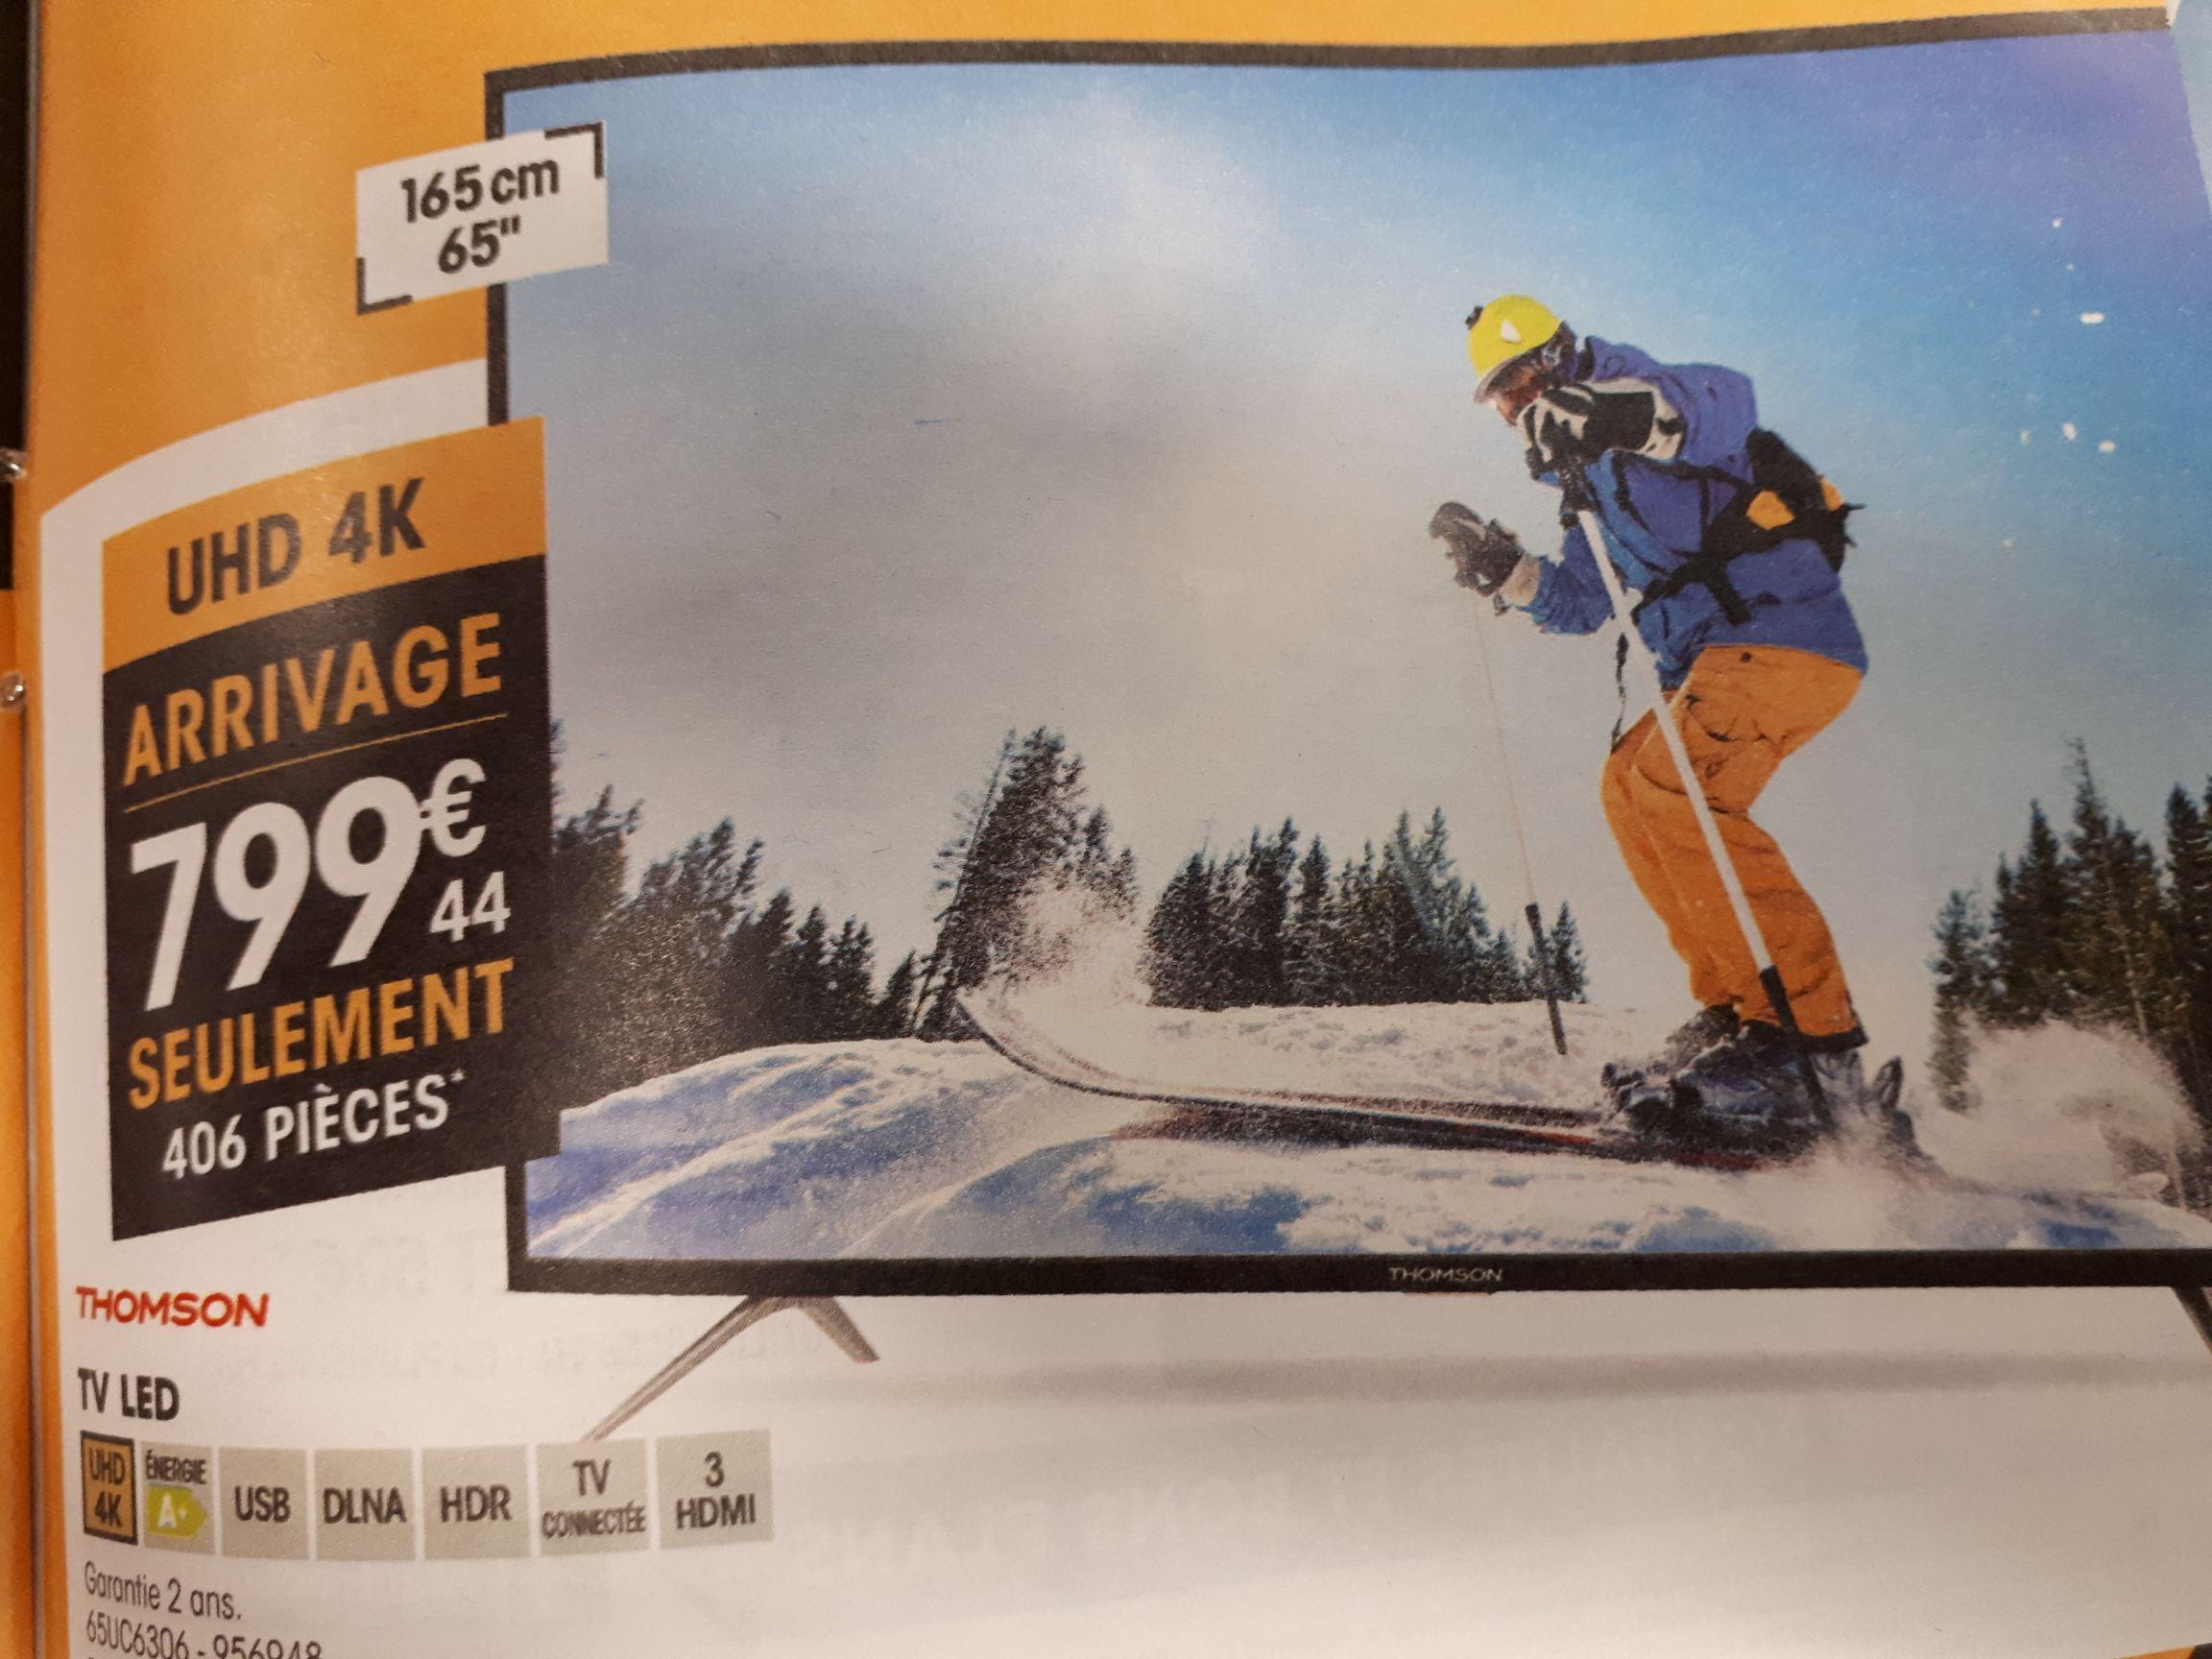 "TV LED 65"" (165cm) Thomson 65UC6306 - HDR - UHD 4K, Smart TV"